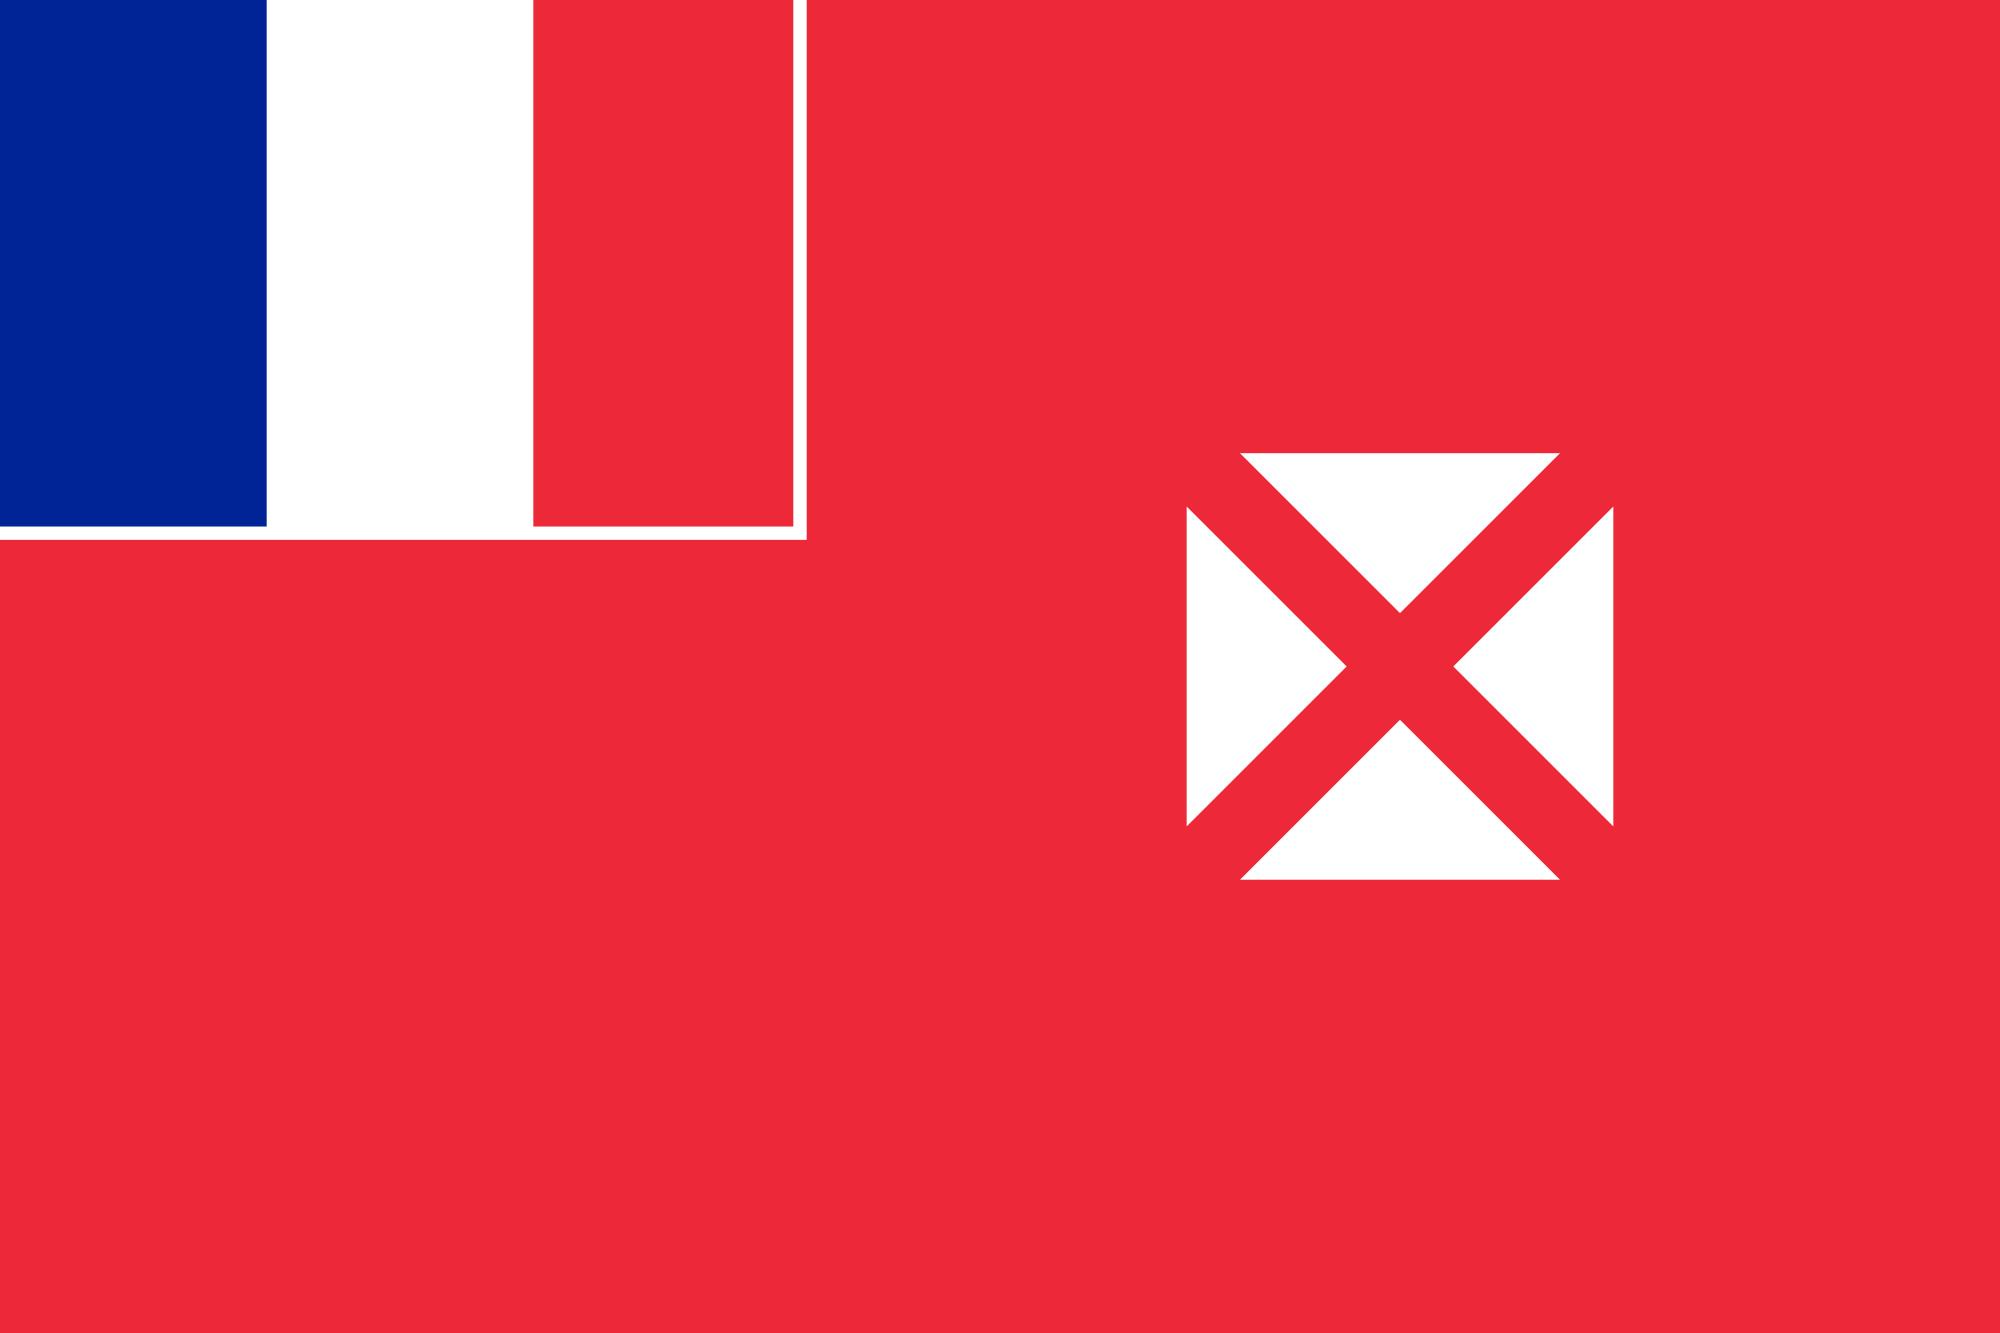 Wallis e futuna, paese, emblema, logo, simbolo - Sfondi HD - Professor-falken.com